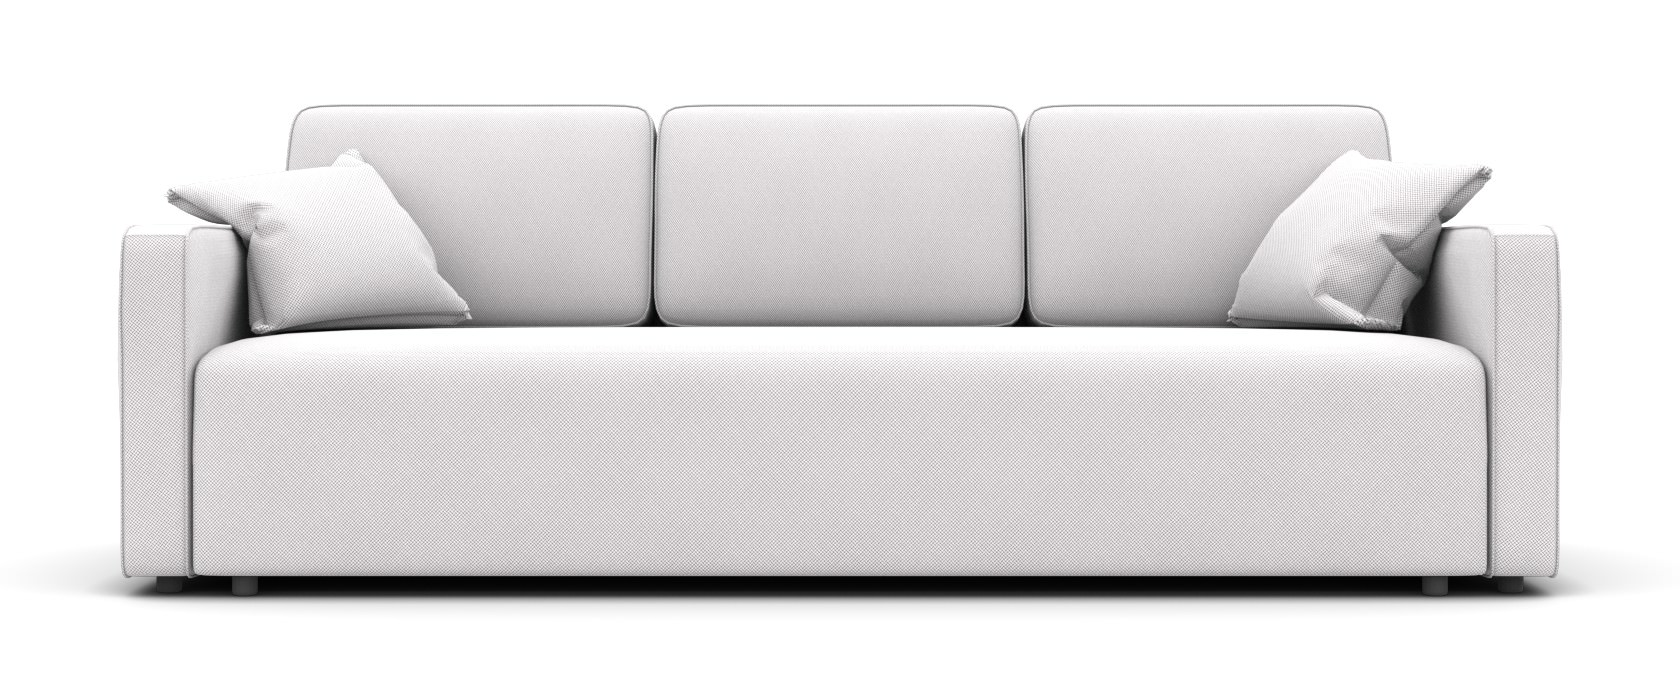 Трехместный диван Alonzo